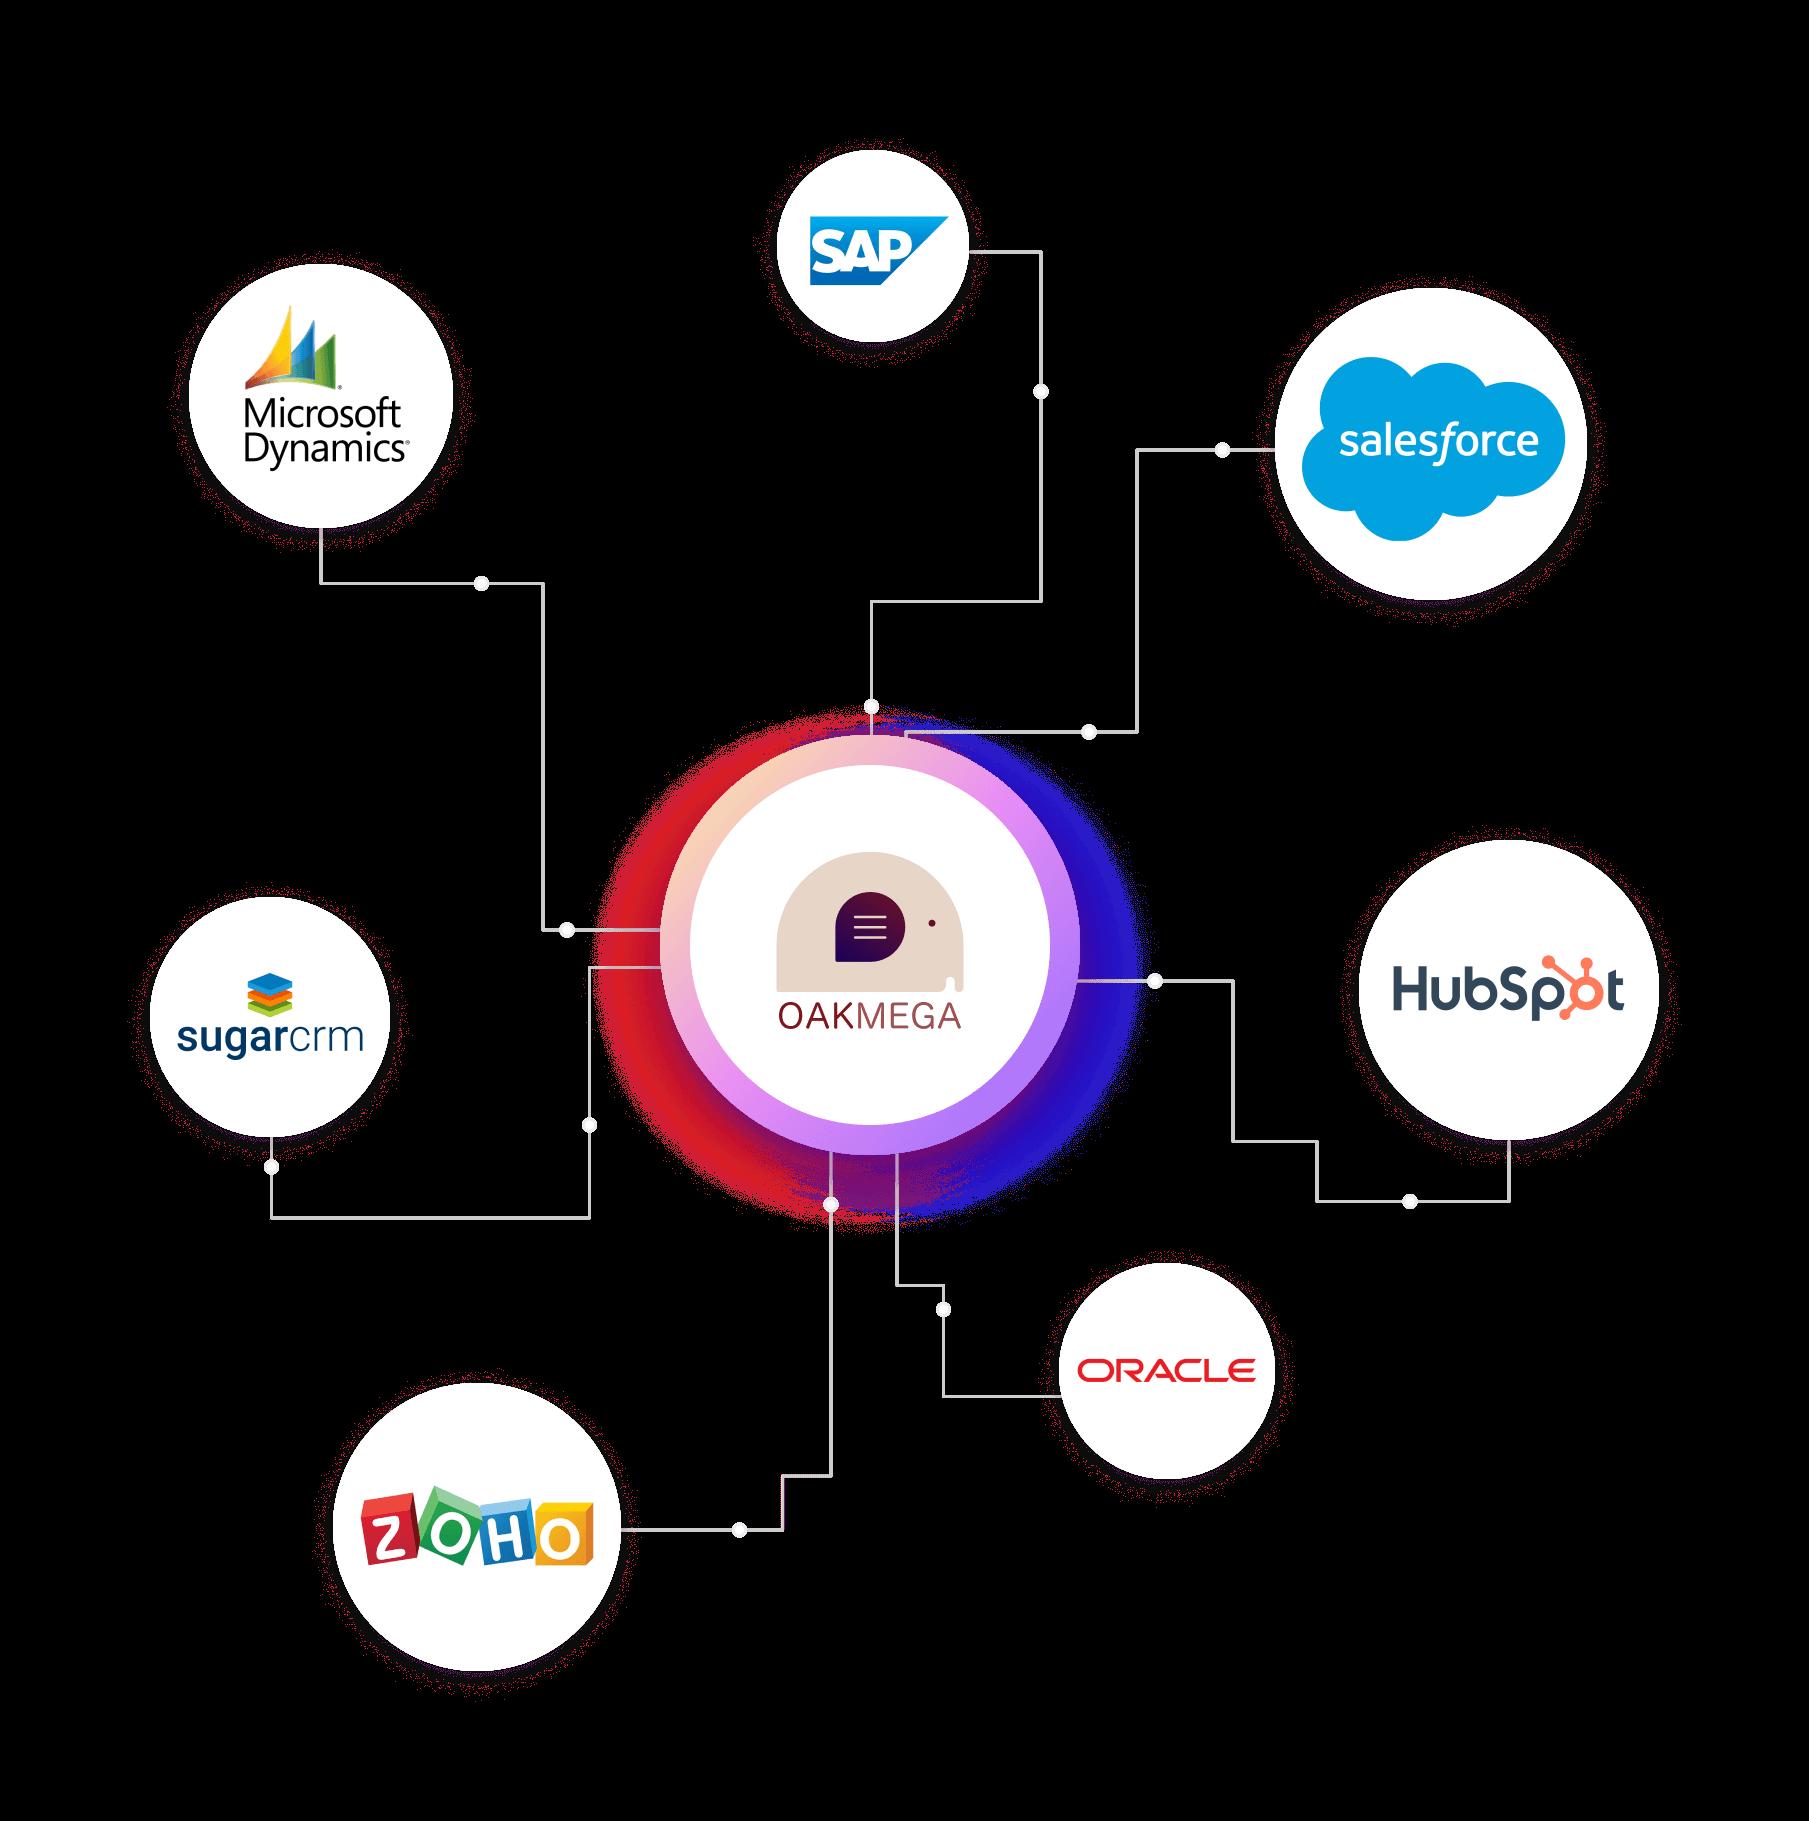 OakMega 能整合 Salesforce, HubSpot 以及其他眾多 CRM